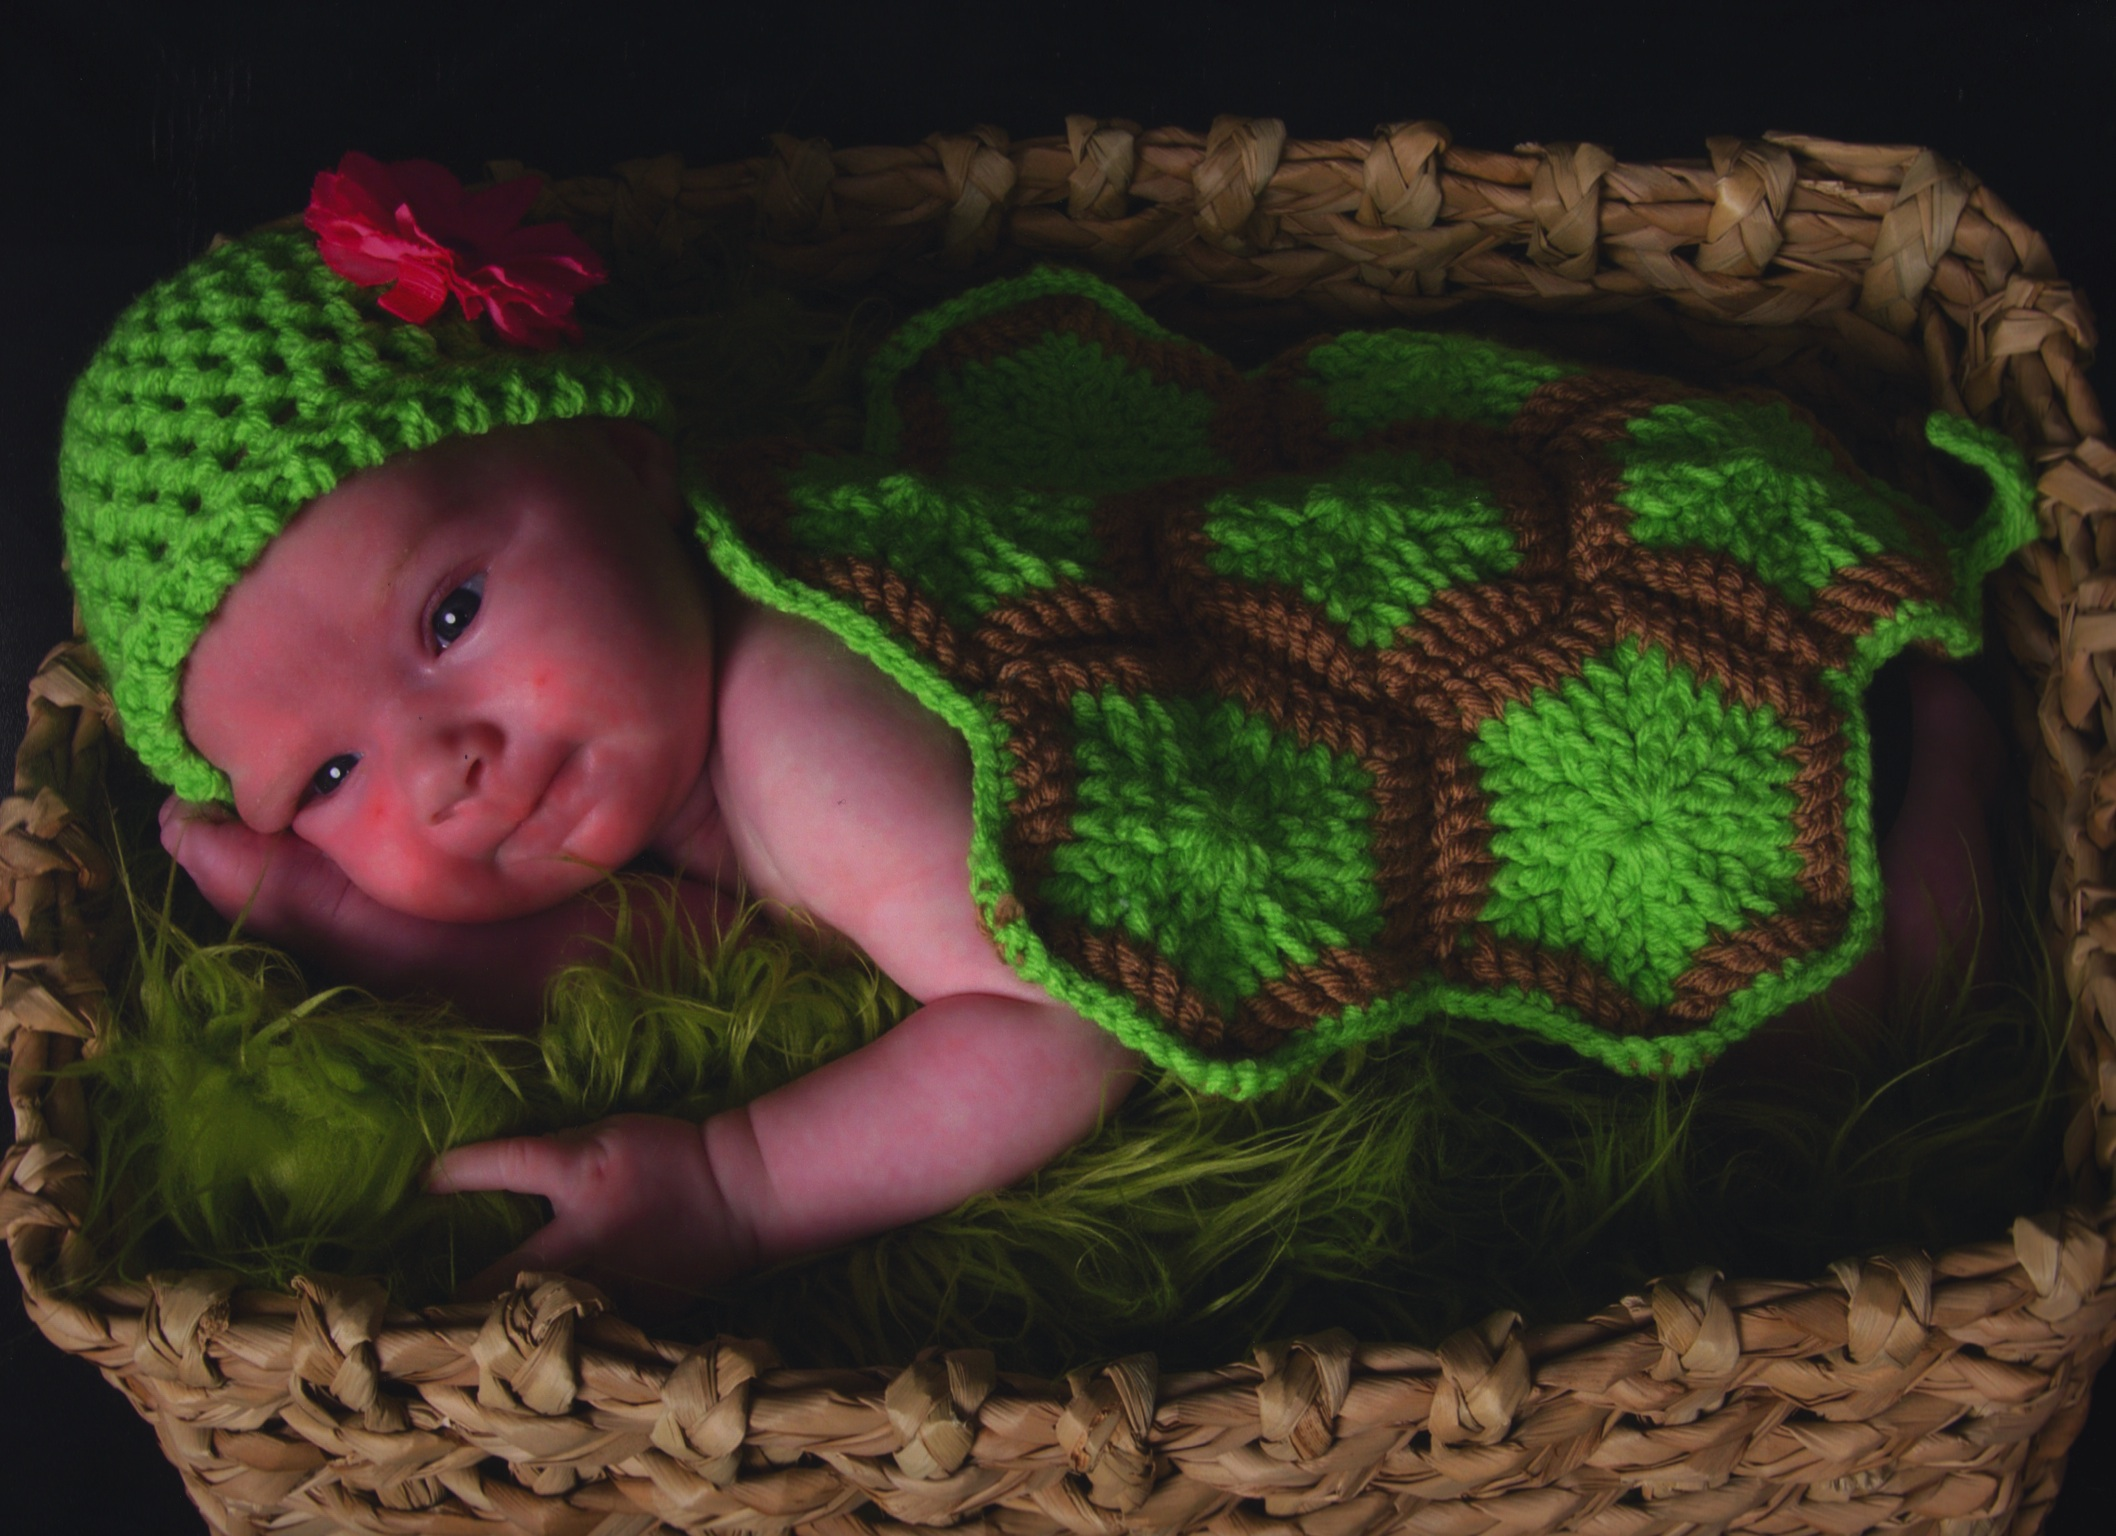 Crochet Pattern For Ninja Turtle Blanket : 301 Moved Permanently